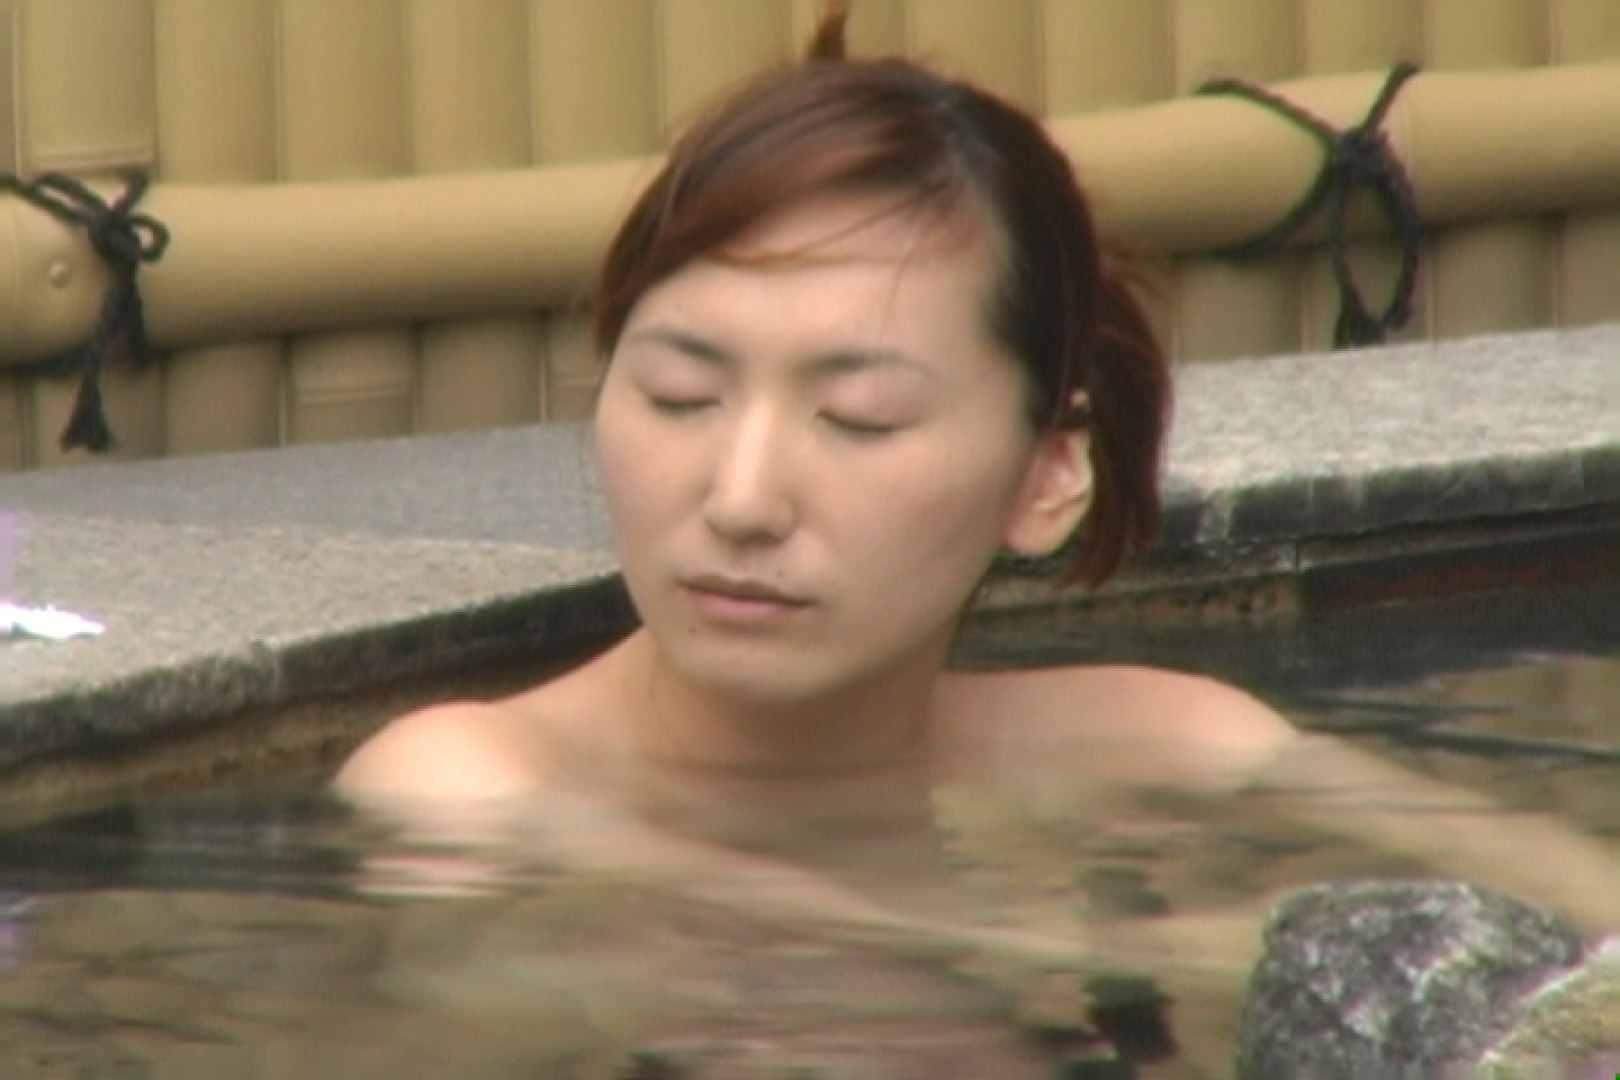 Aquaな露天風呂Vol.616 露天風呂編  89PIX 50